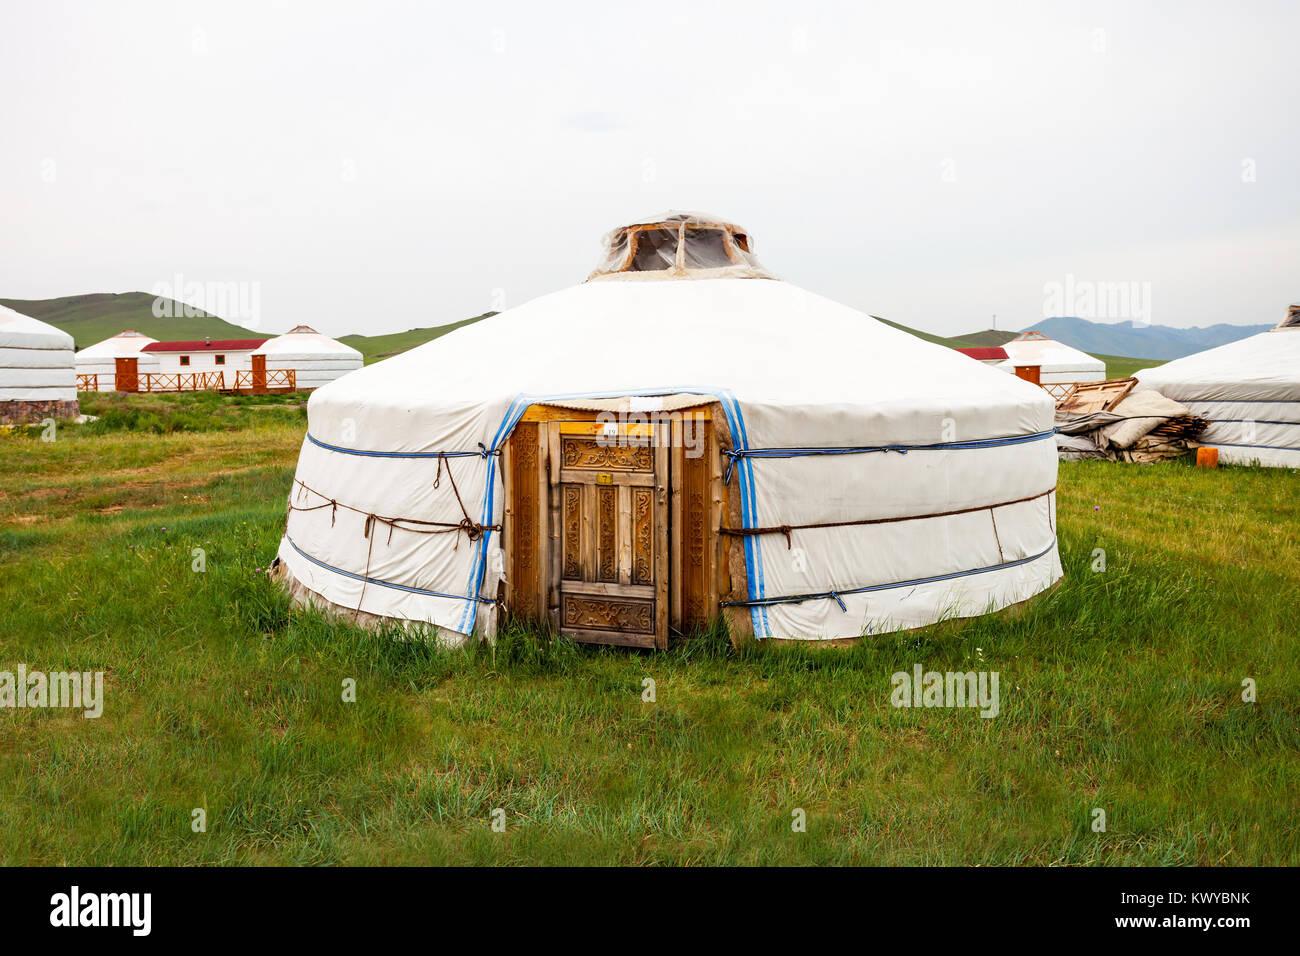 Traditional mongolian yurt in the center of Ulaanbaatar, Mongolia - Stock Image